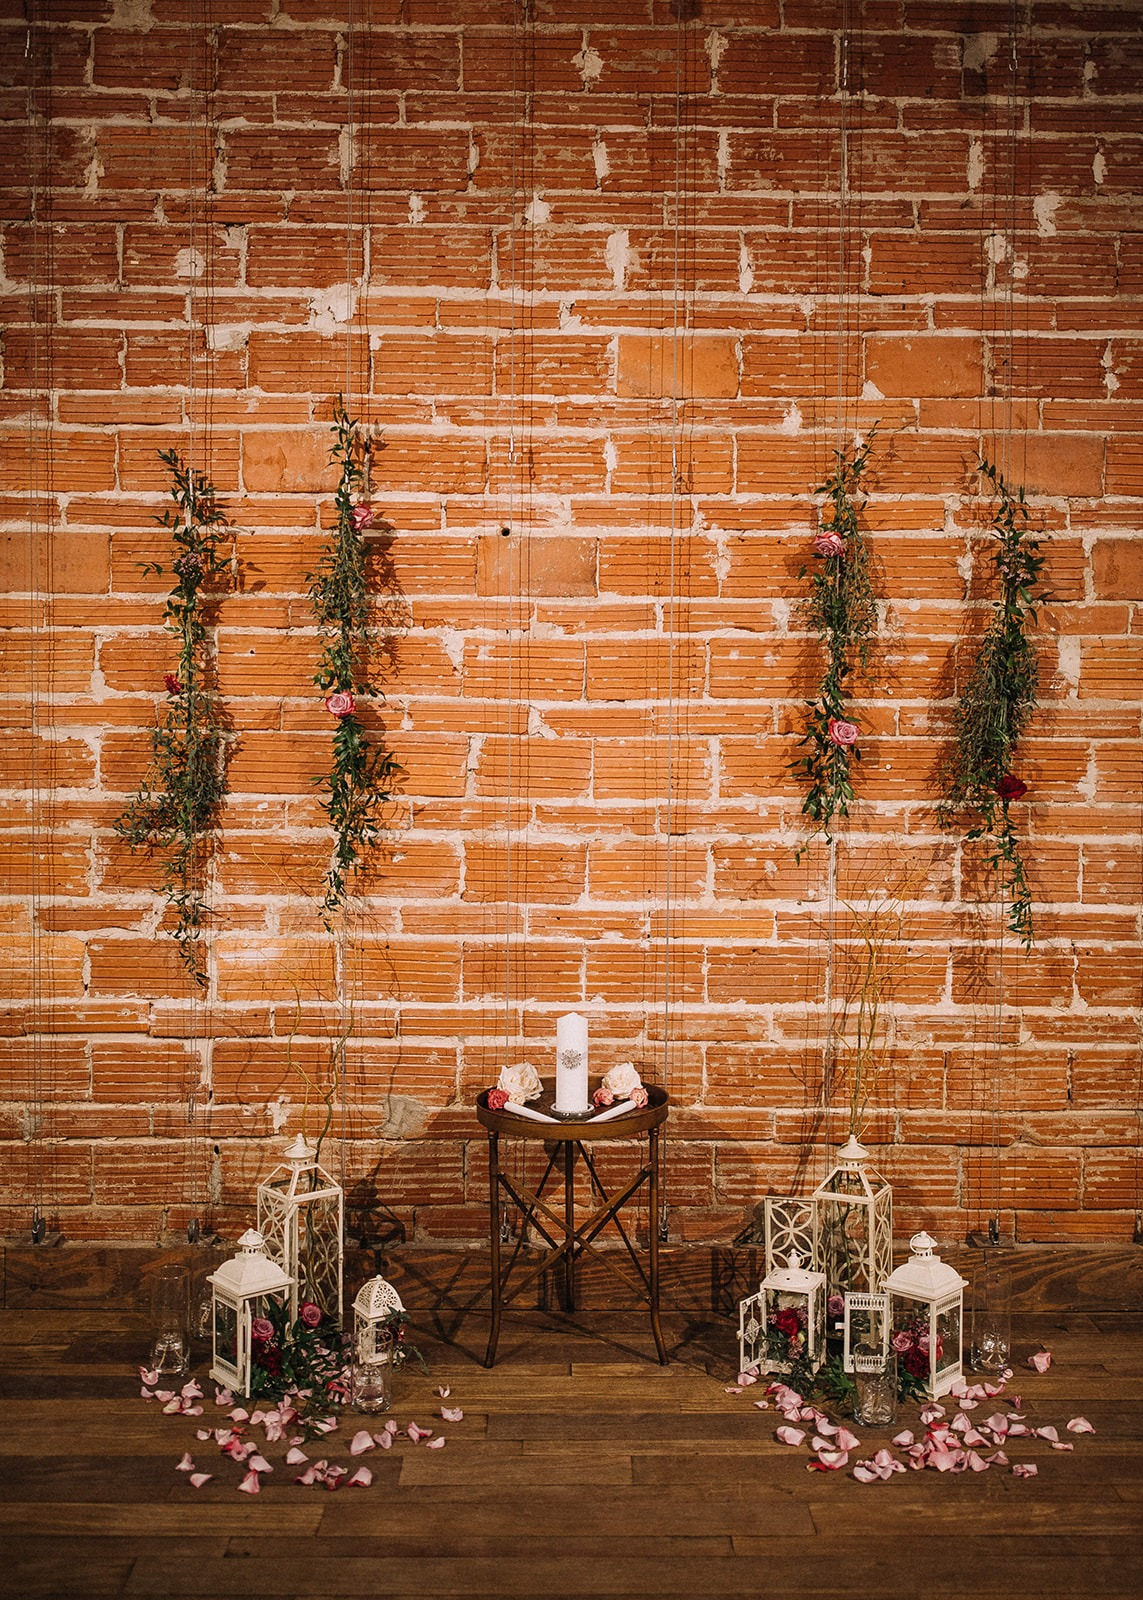 Urban Downtown St Pete Wedding with brick wall backdrop, lanterns, and greenery florals | Unique Tampa Bay Wedding Venue NOVA 535 Venue